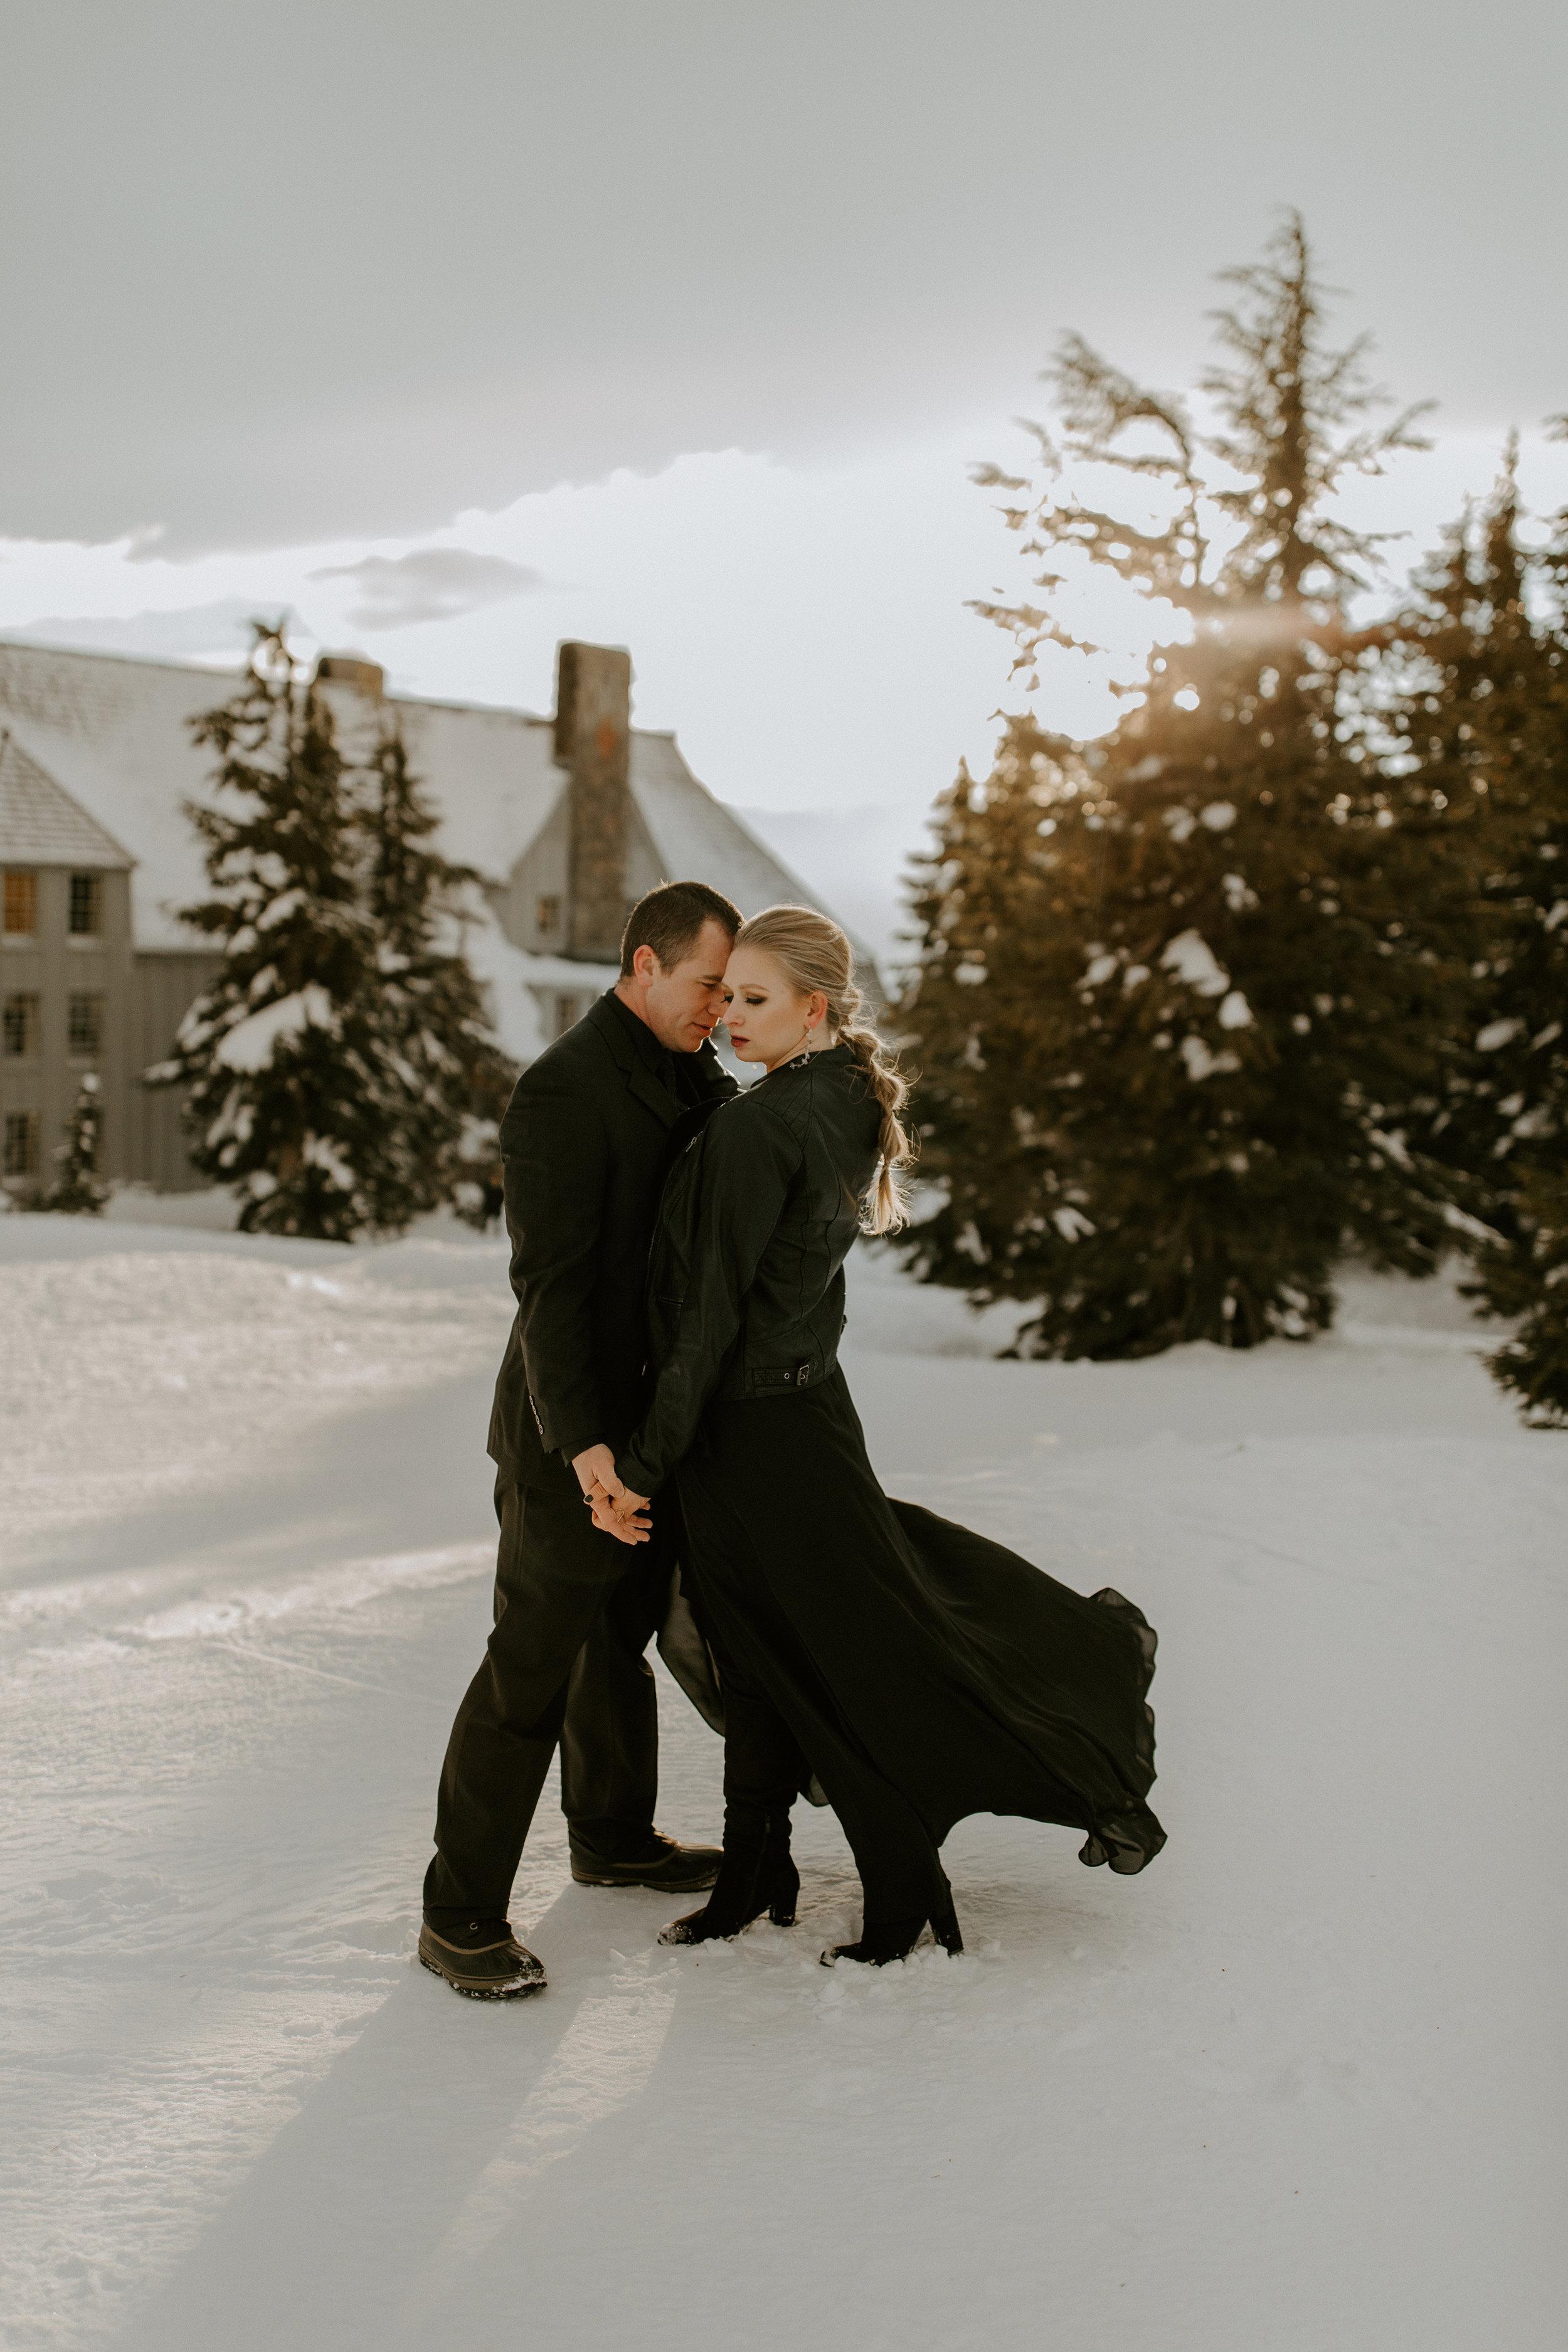 oregon-snowy-engagement-shoot-brianna-swan.jpg